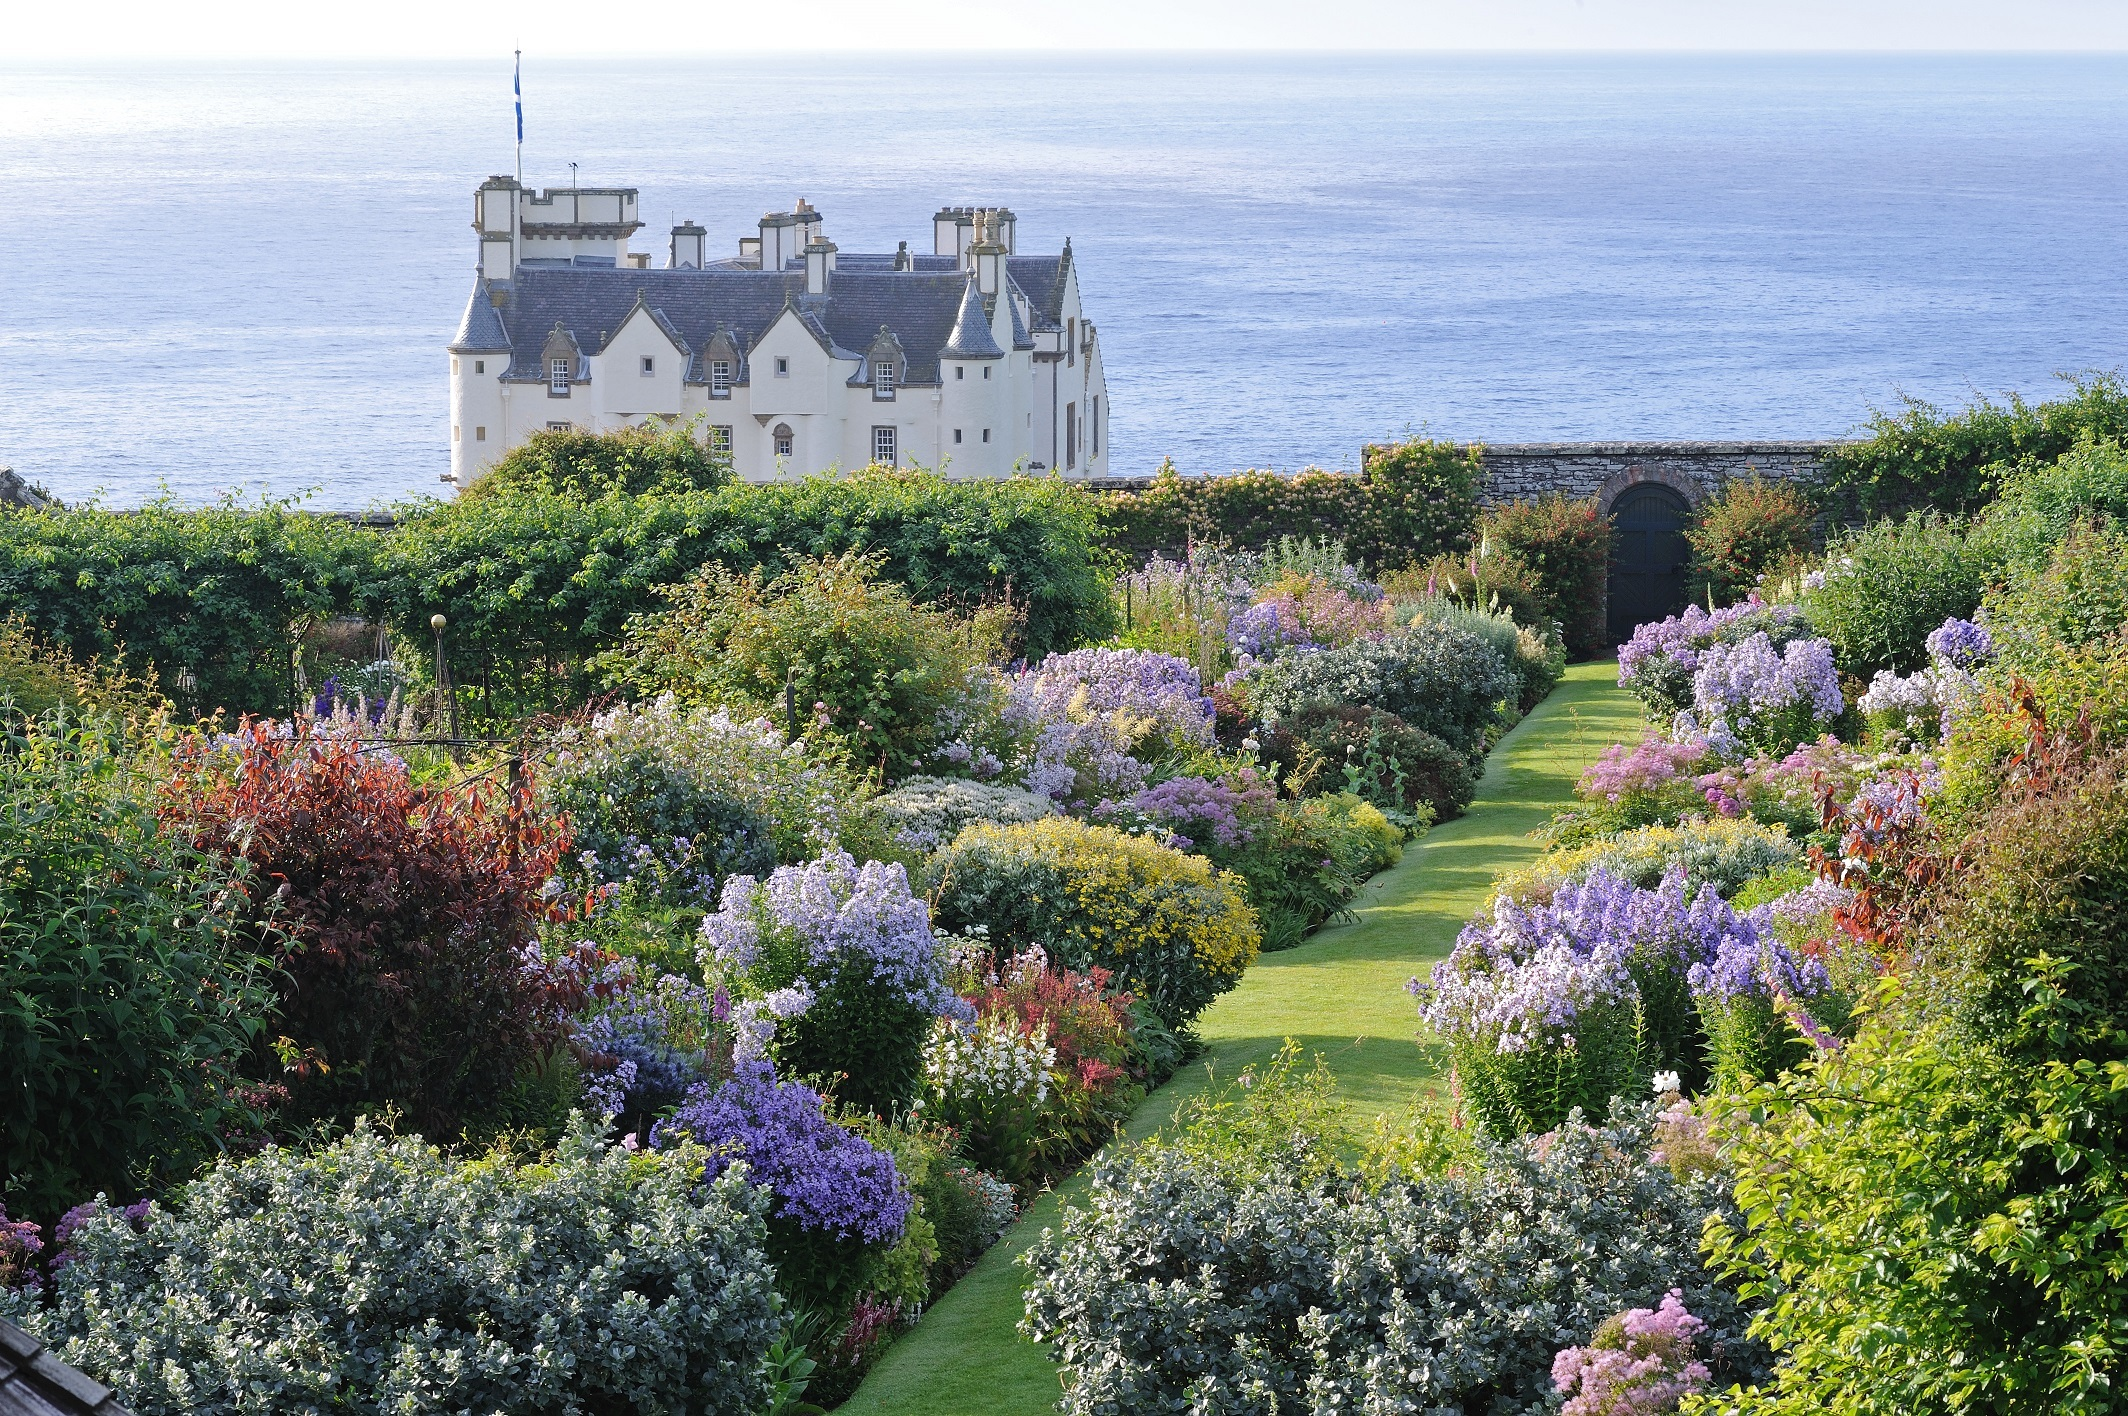 Garden of the week: Dunbeath Castle Gardens